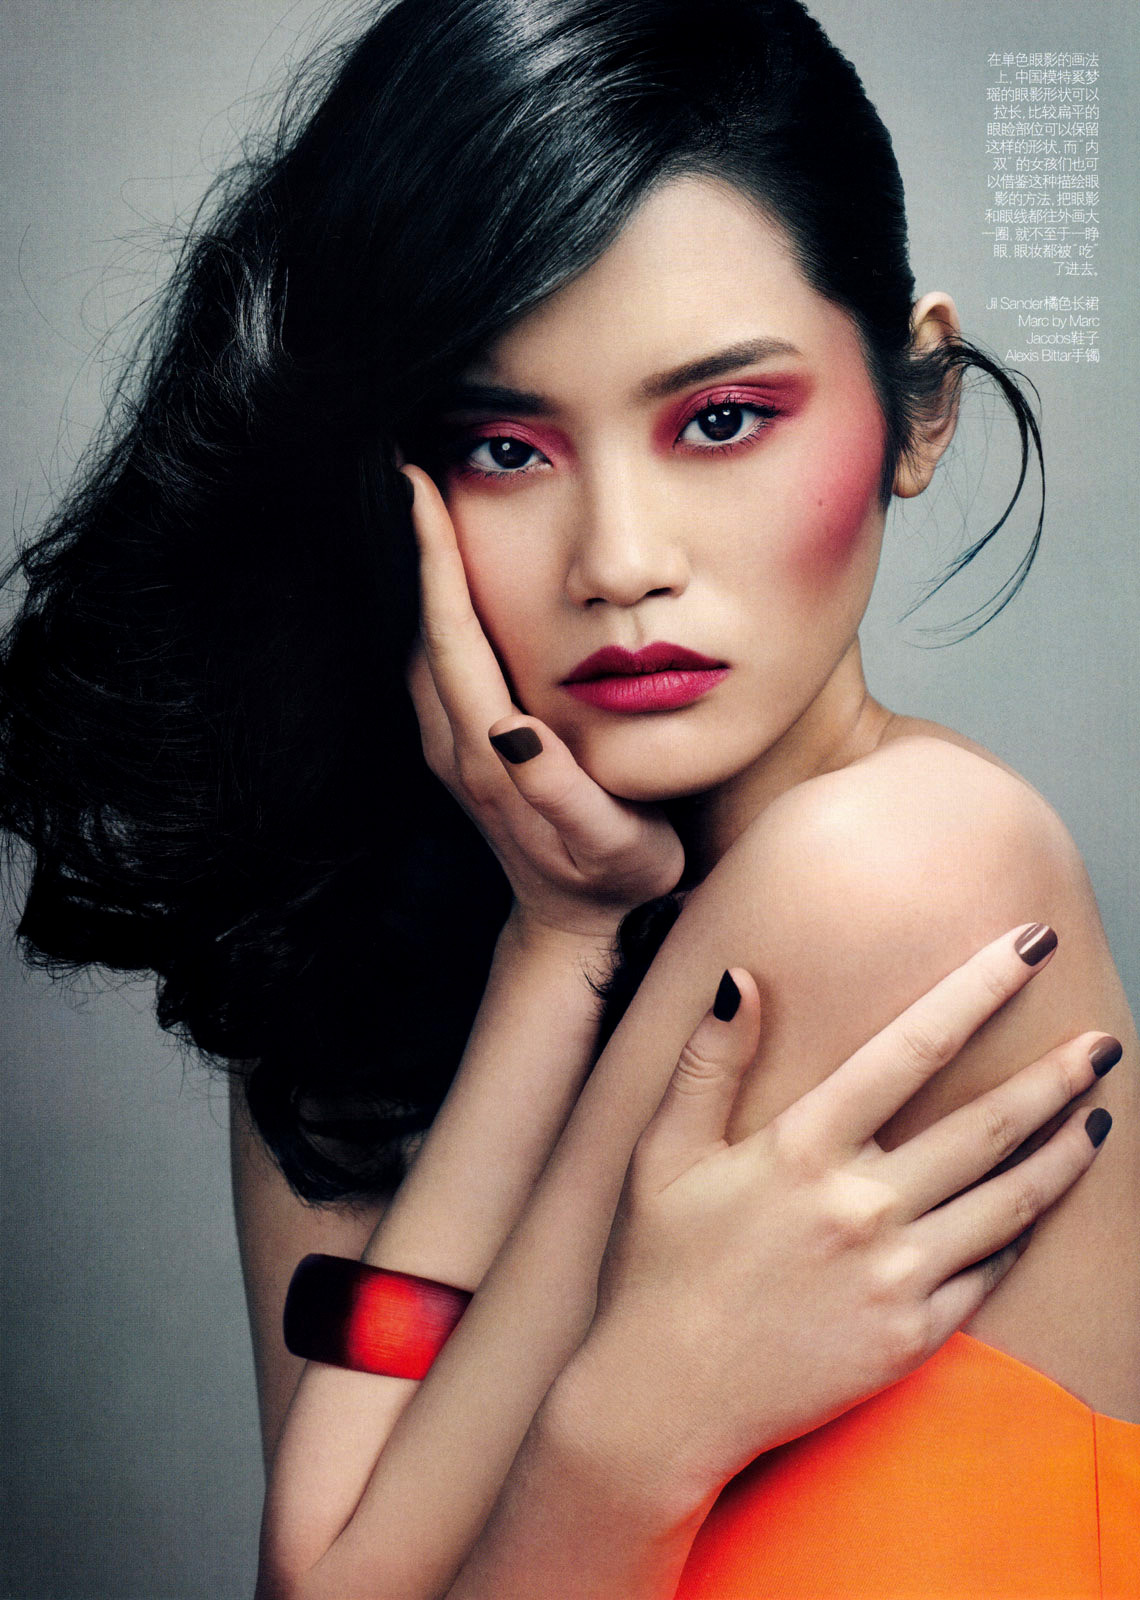 Asian Models Blog Editorial Ming Xi In Vogue China: ASIAN MODELS BLOG: EDITORIAL: Ming Xi In Vogue China